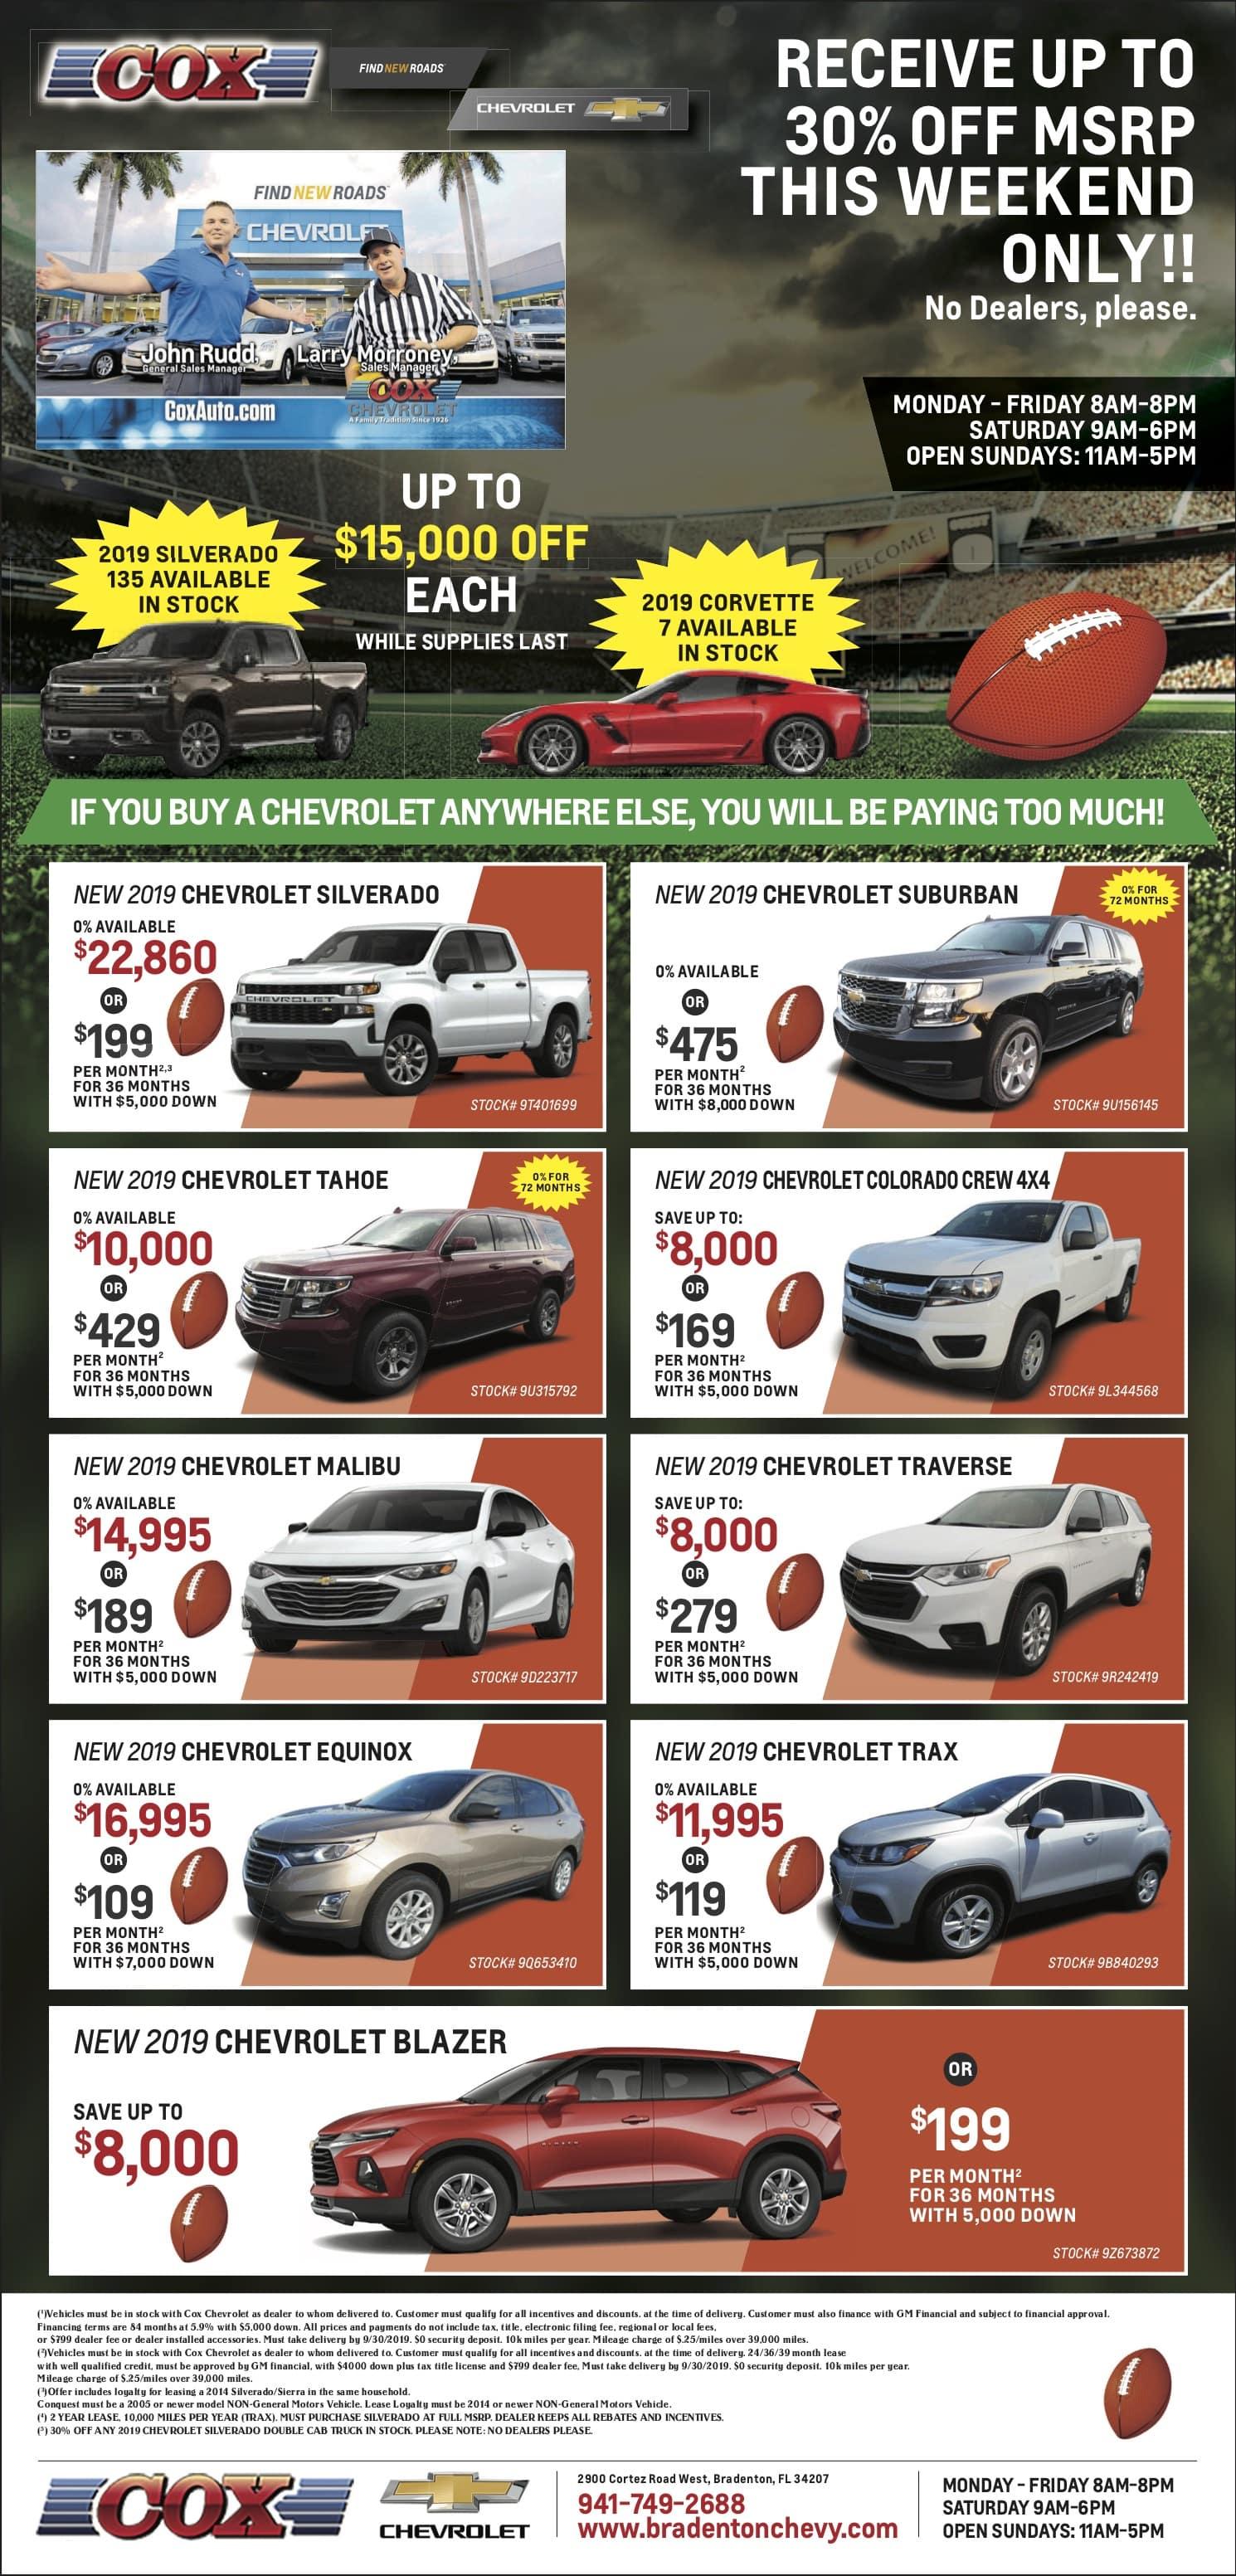 Cox Chevy Weekly Specials Ad